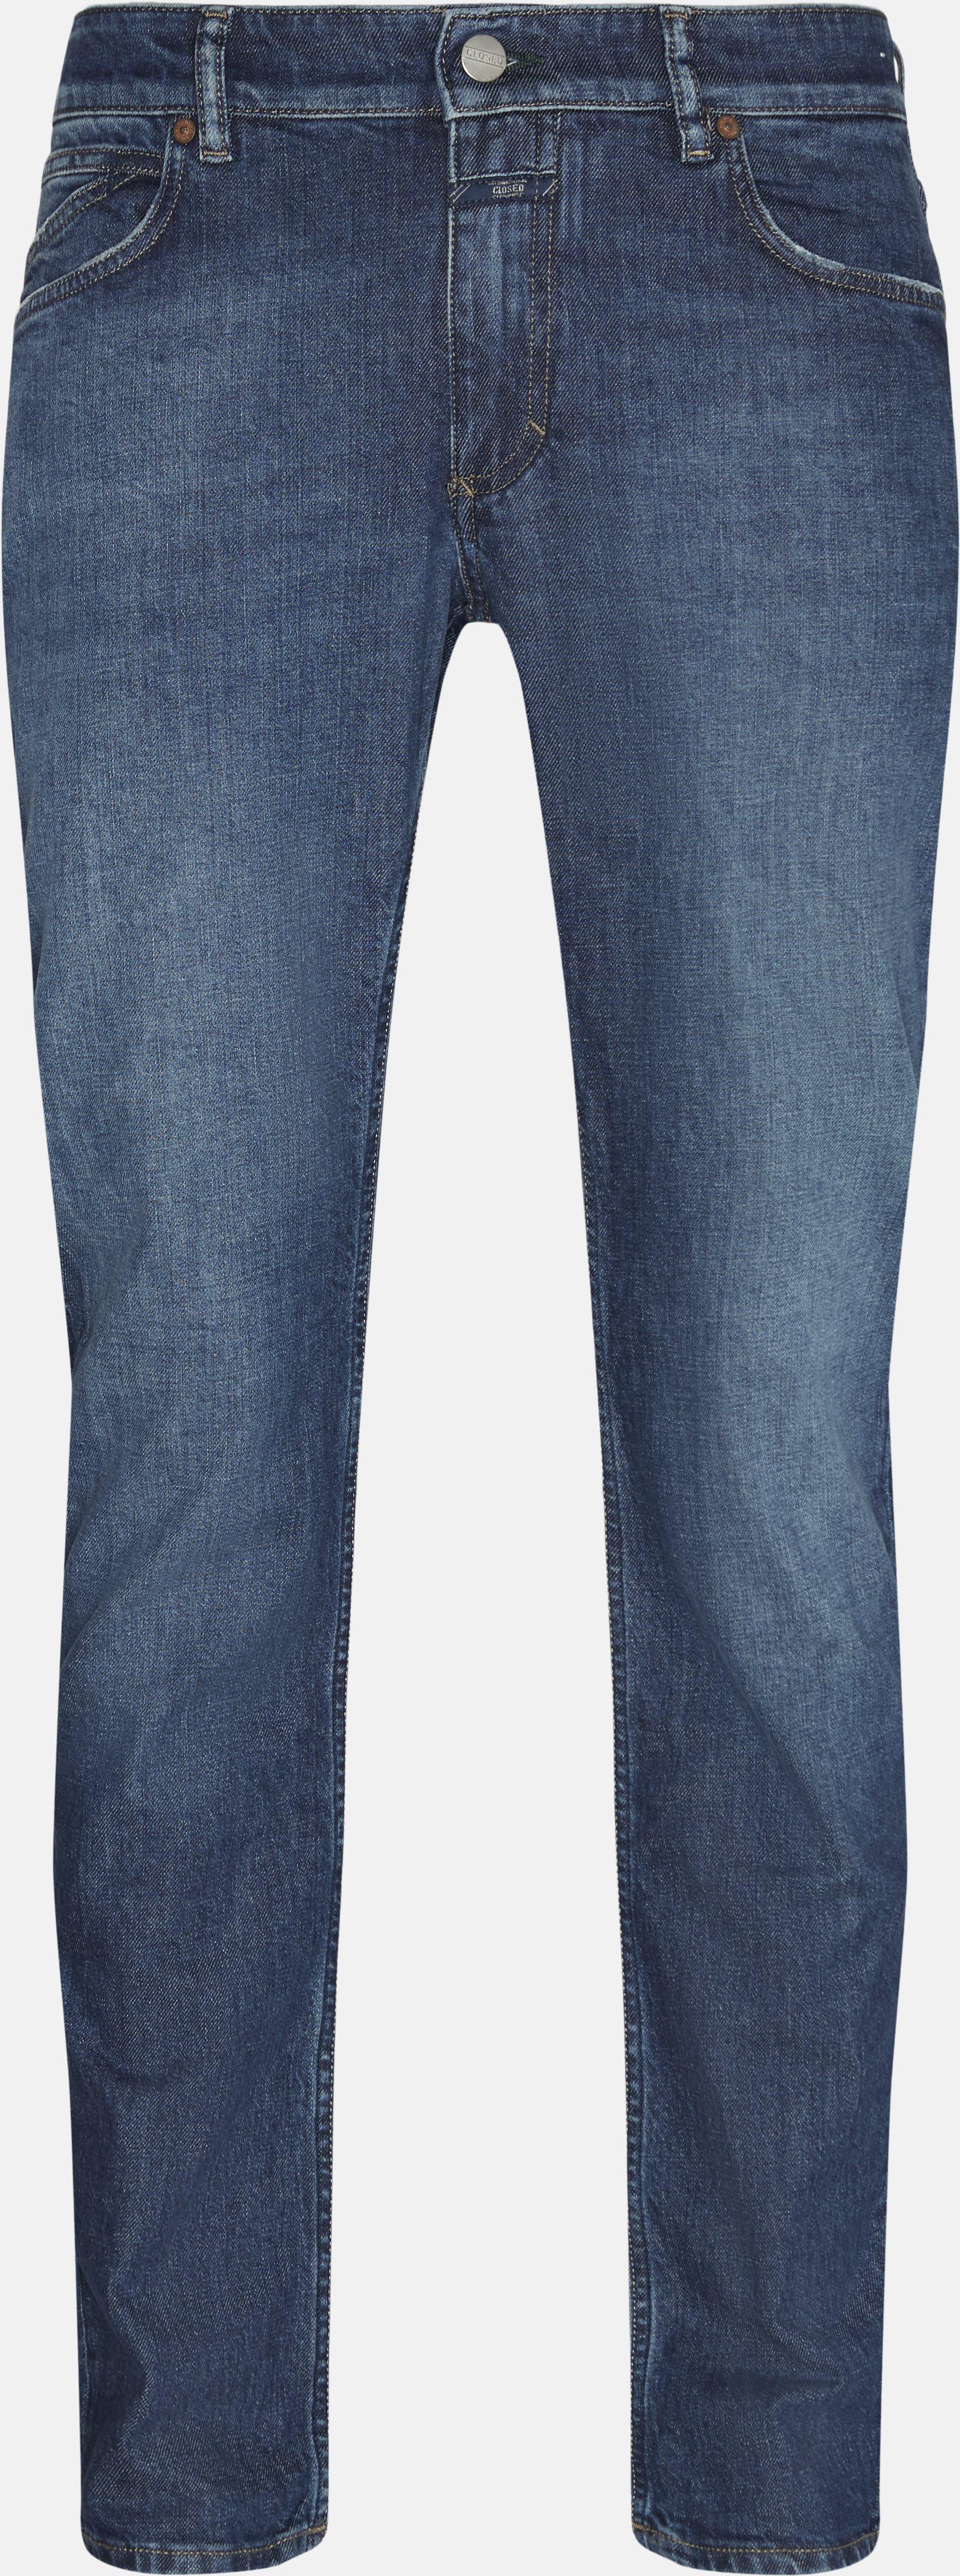 Jeans - Slim fit - Blue